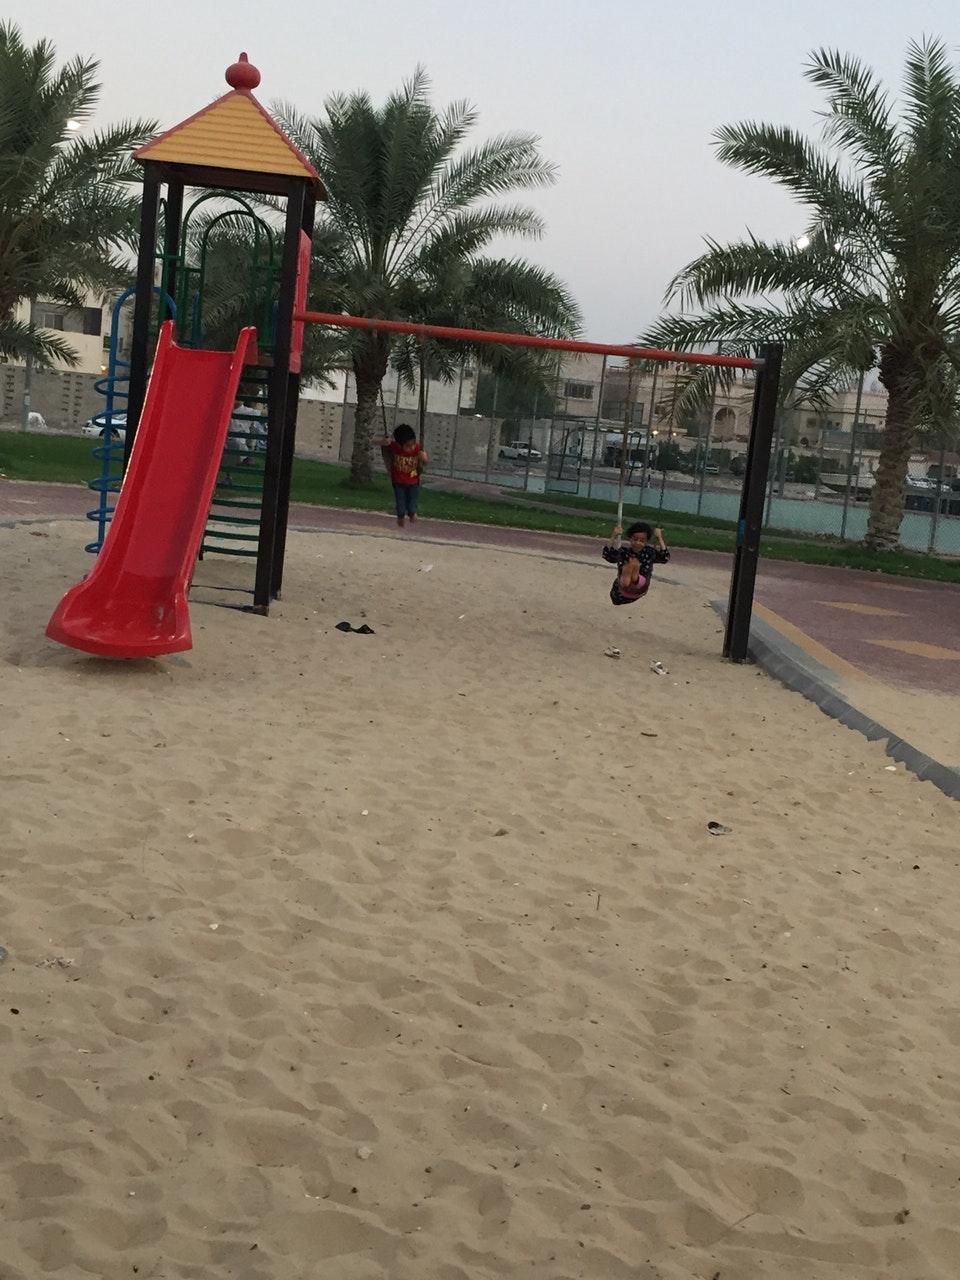 Clove Park